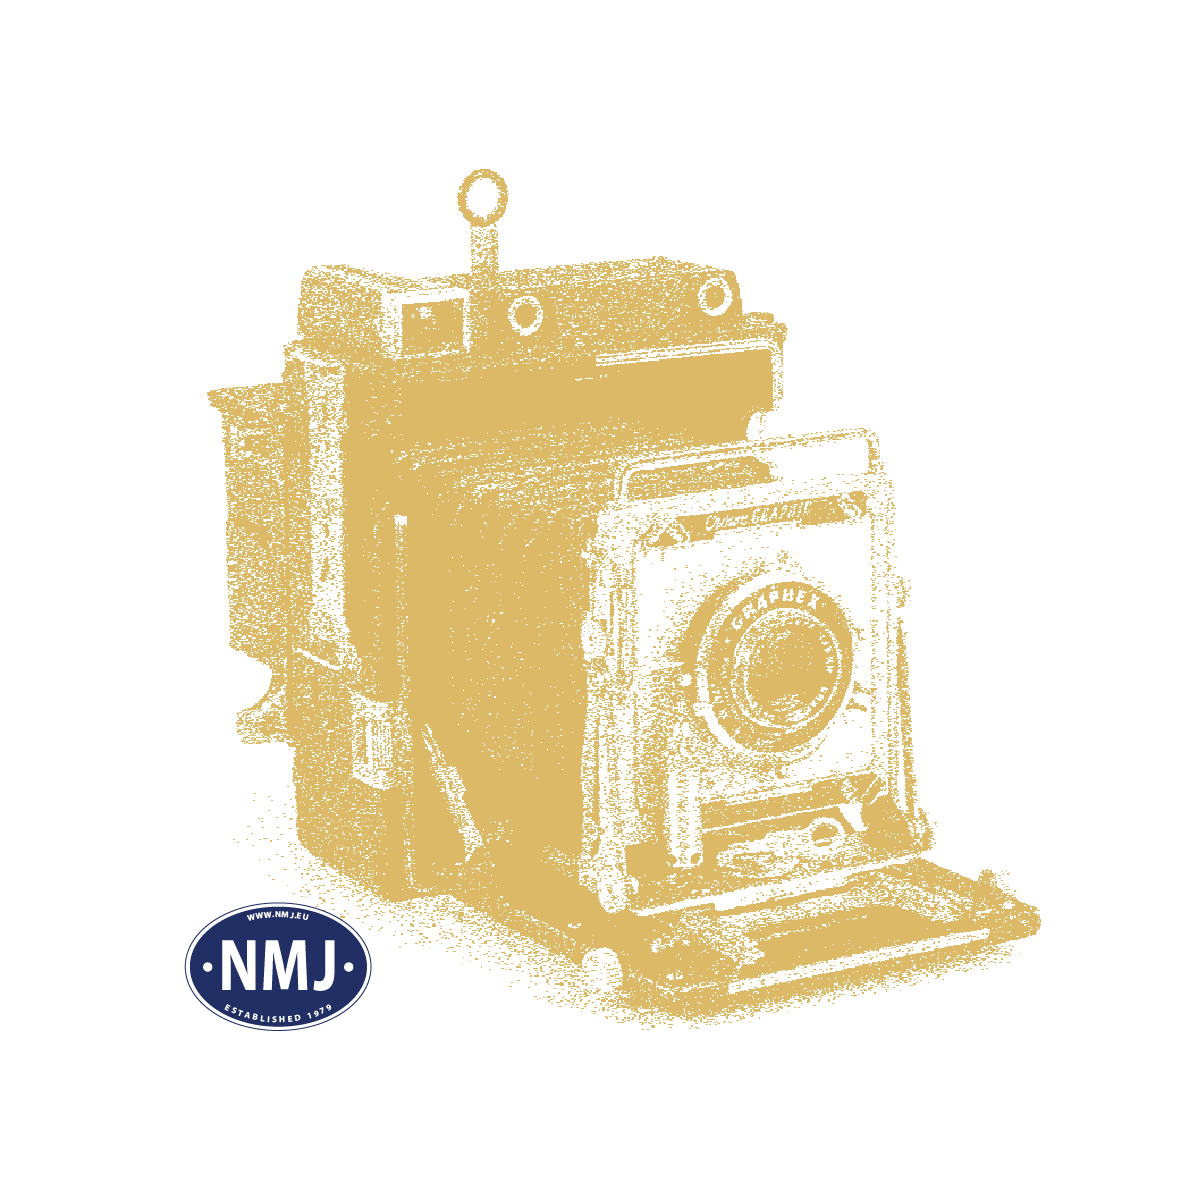 NMJT90403 - NMJ Topline 5404 Diesellok der SNCB, DCC m/ Sound